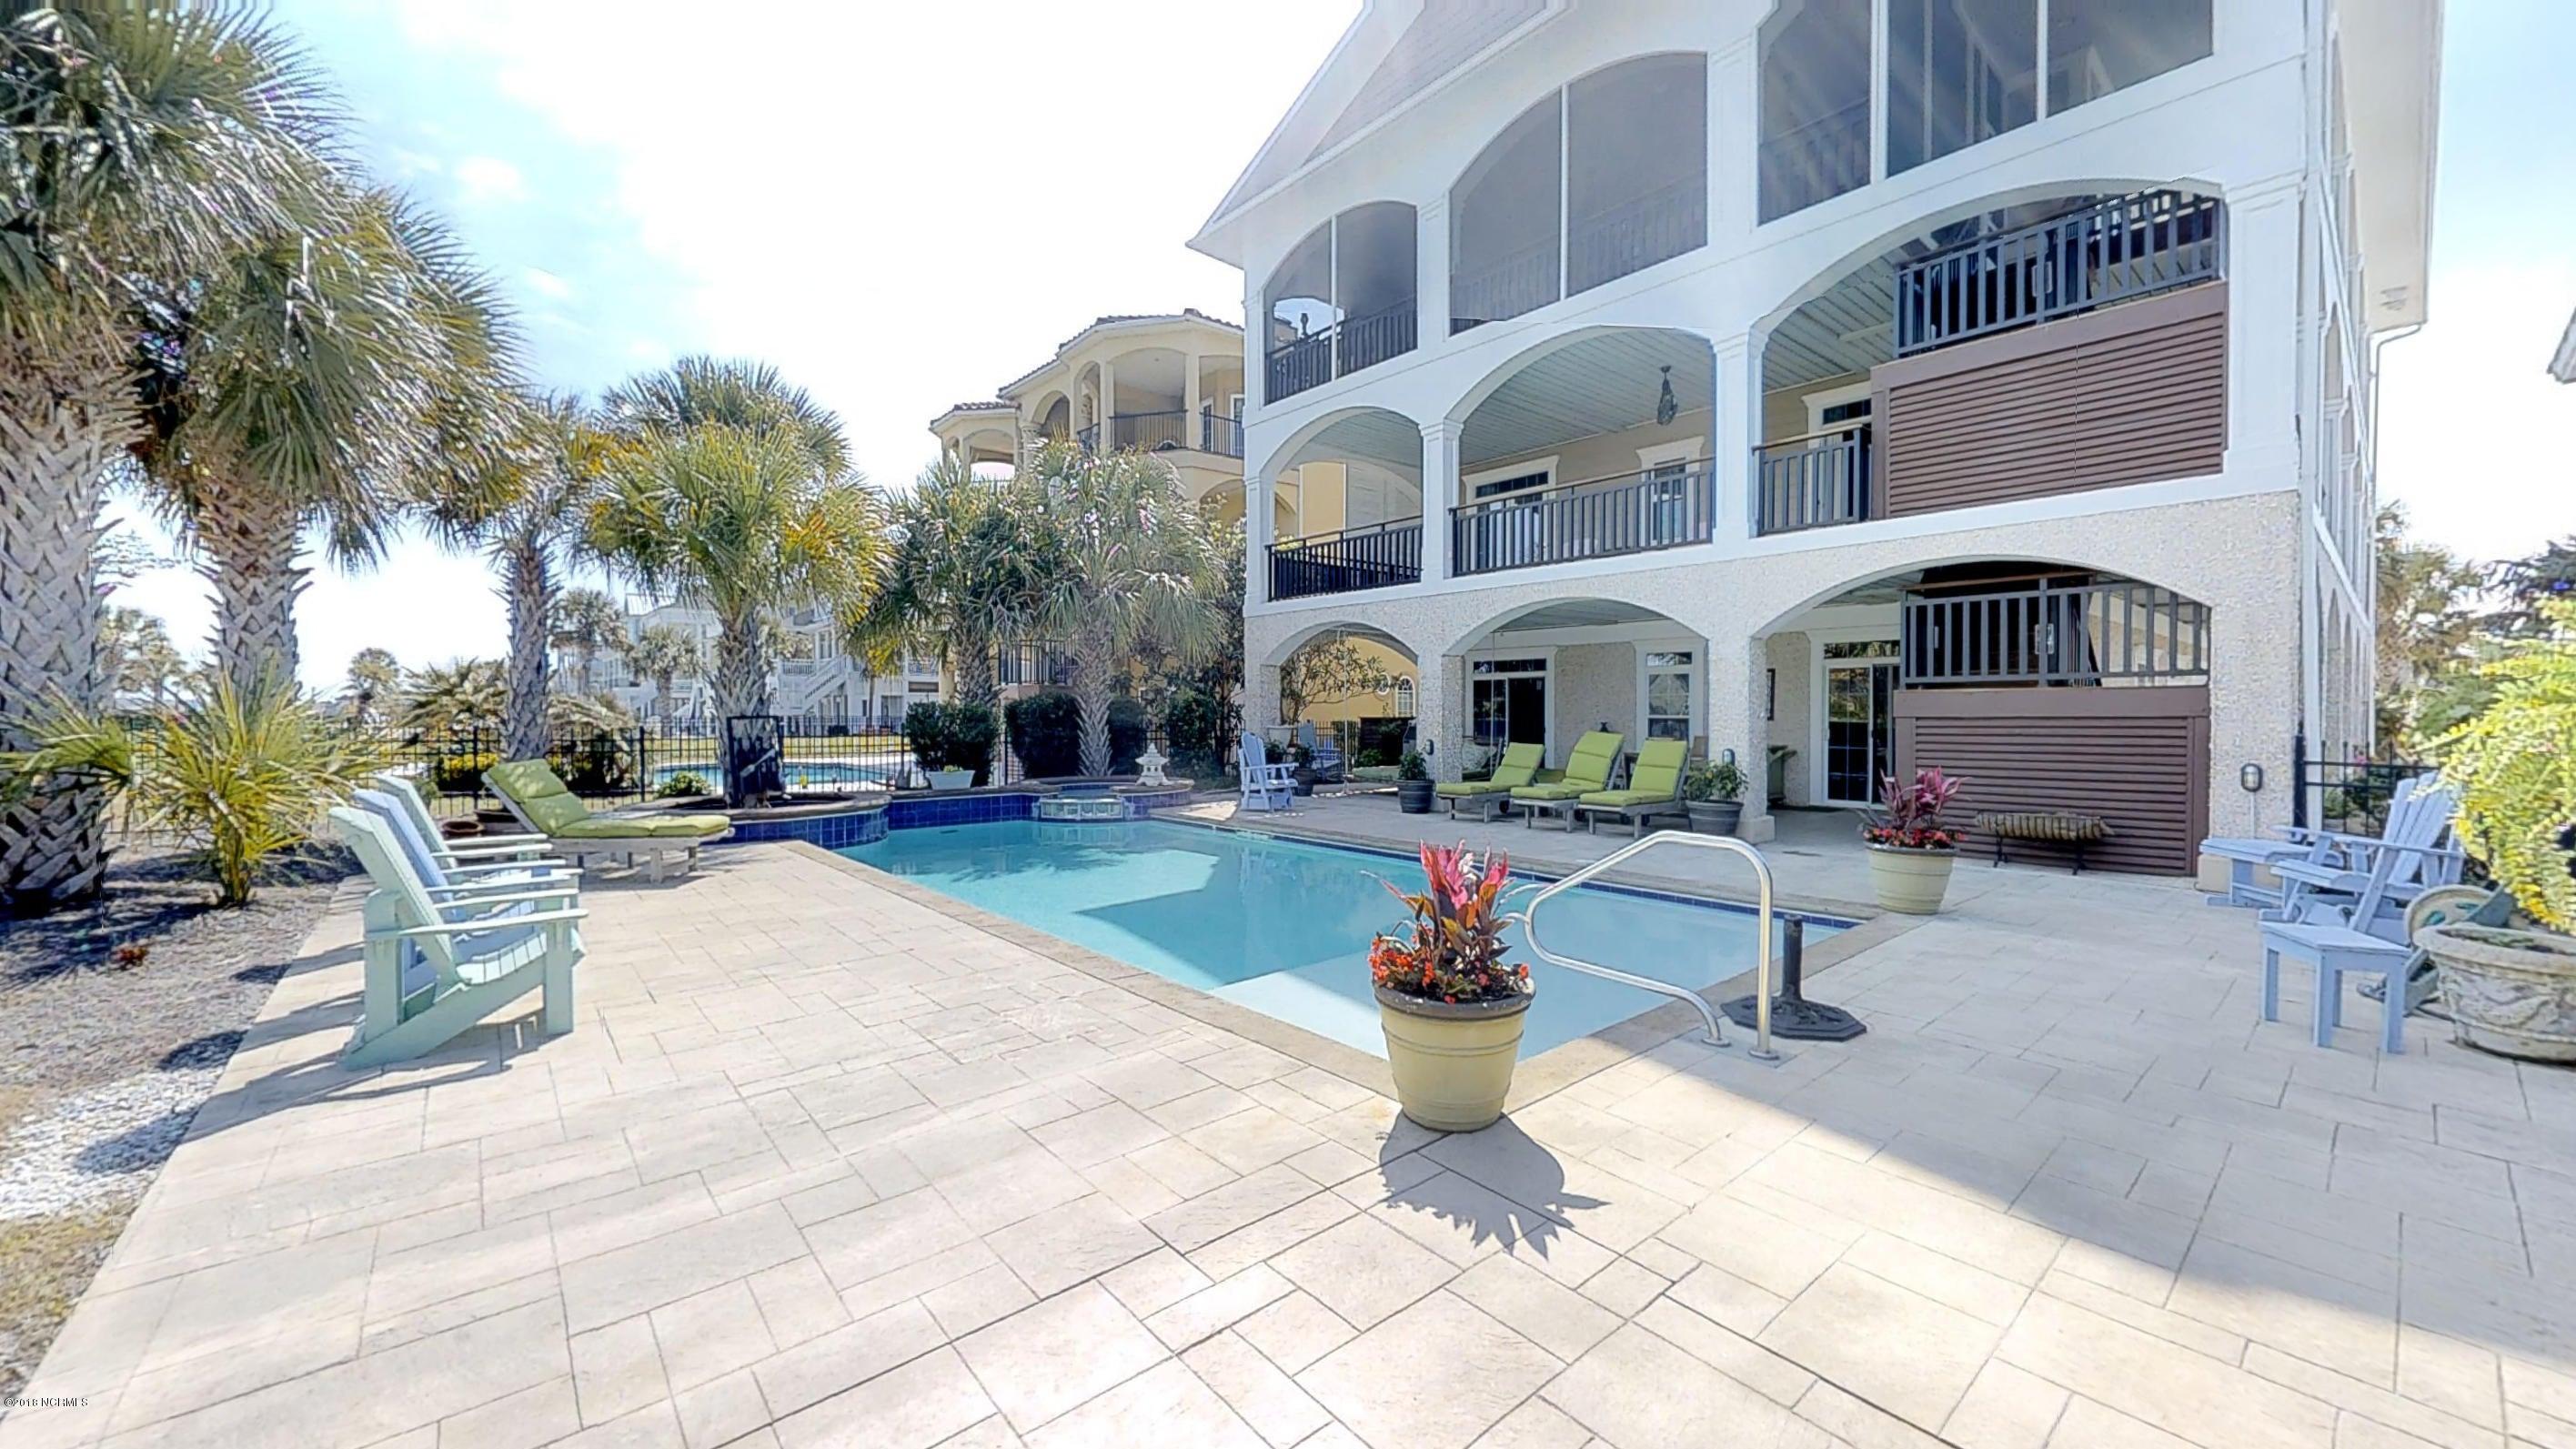 Ocean Isle Beach Real Estate - http://cdn.resize.sparkplatform.com/ncr/1024x768/true/20180414120450517987000000-o.jpg